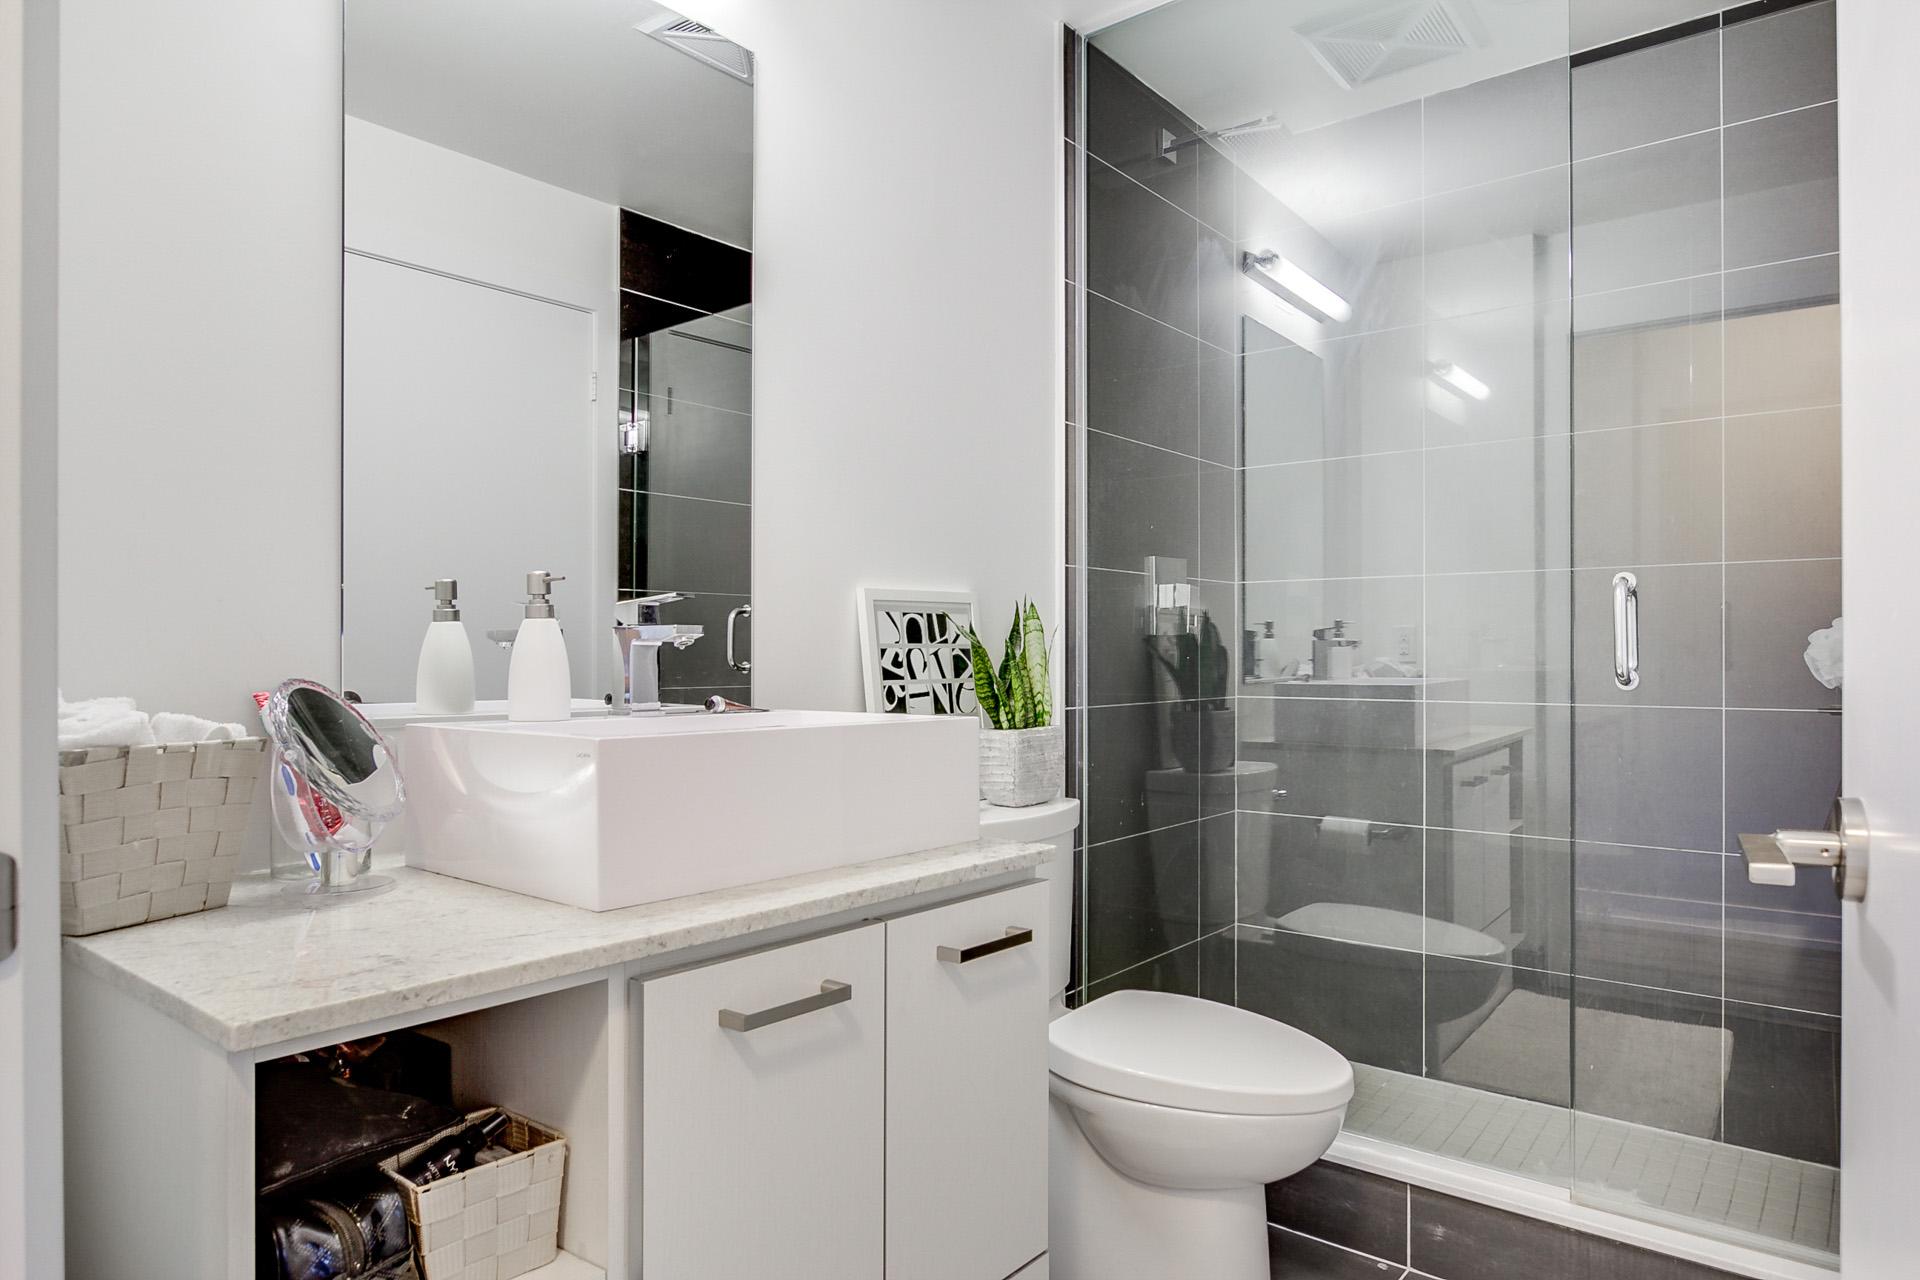 18_bathroom1.jpg